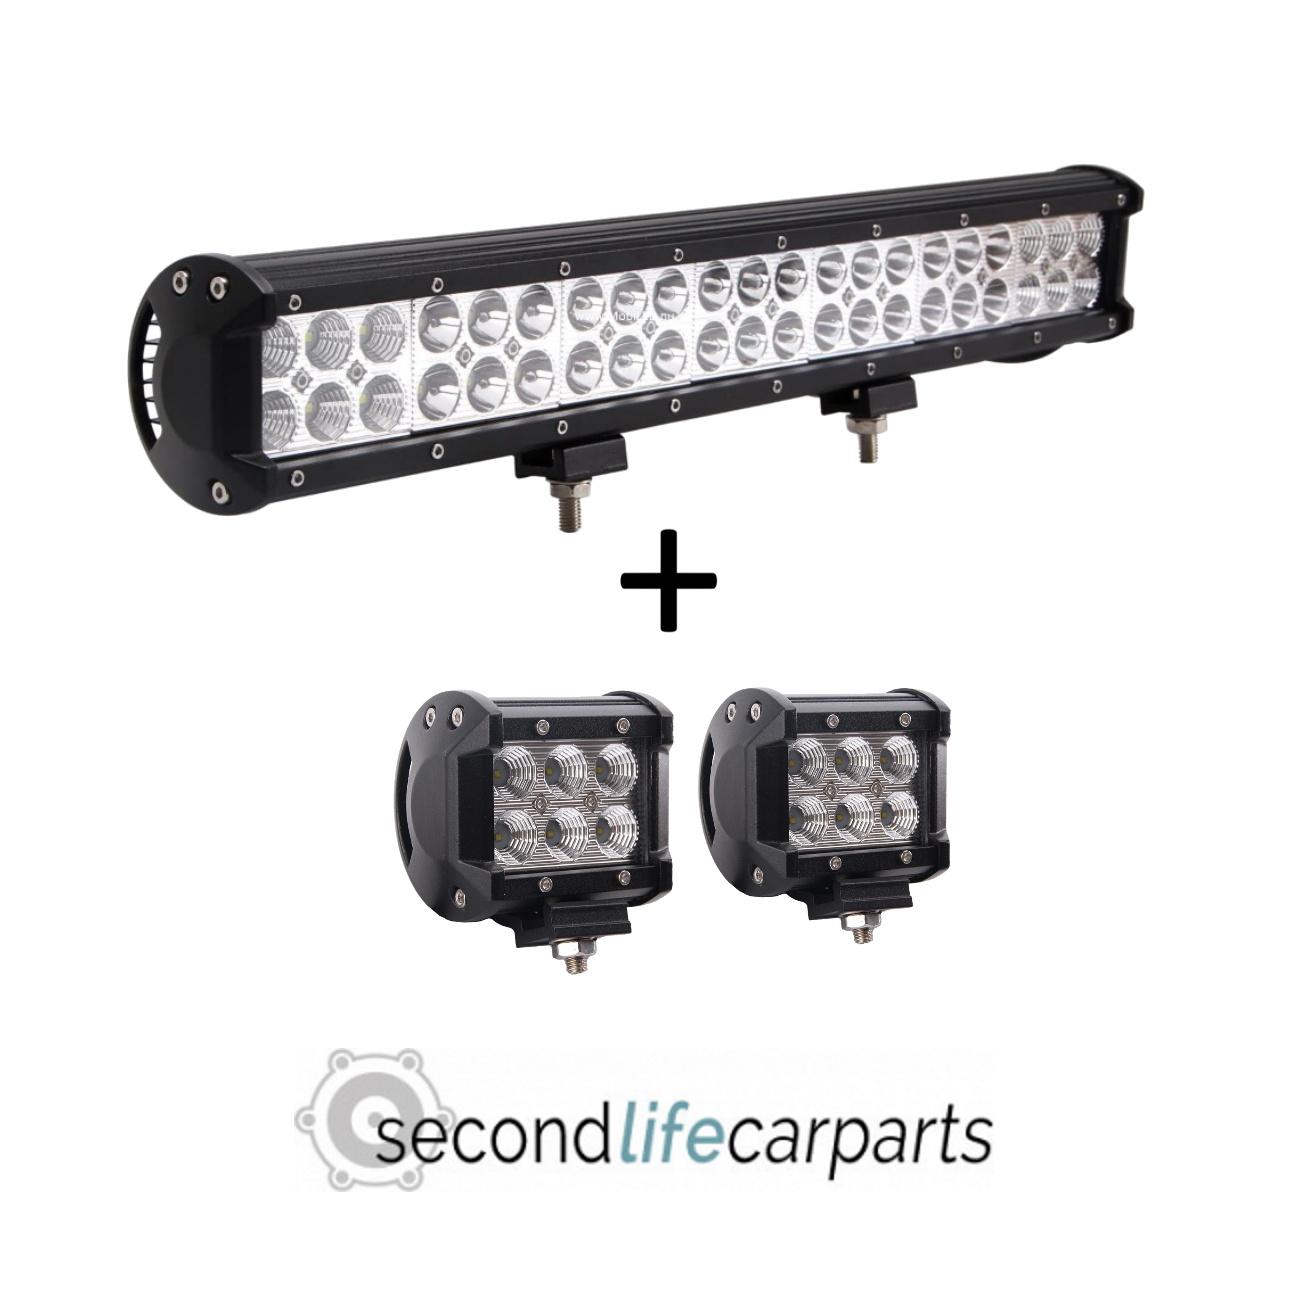 126w combo beam light bar + 2x 18w breedstraler